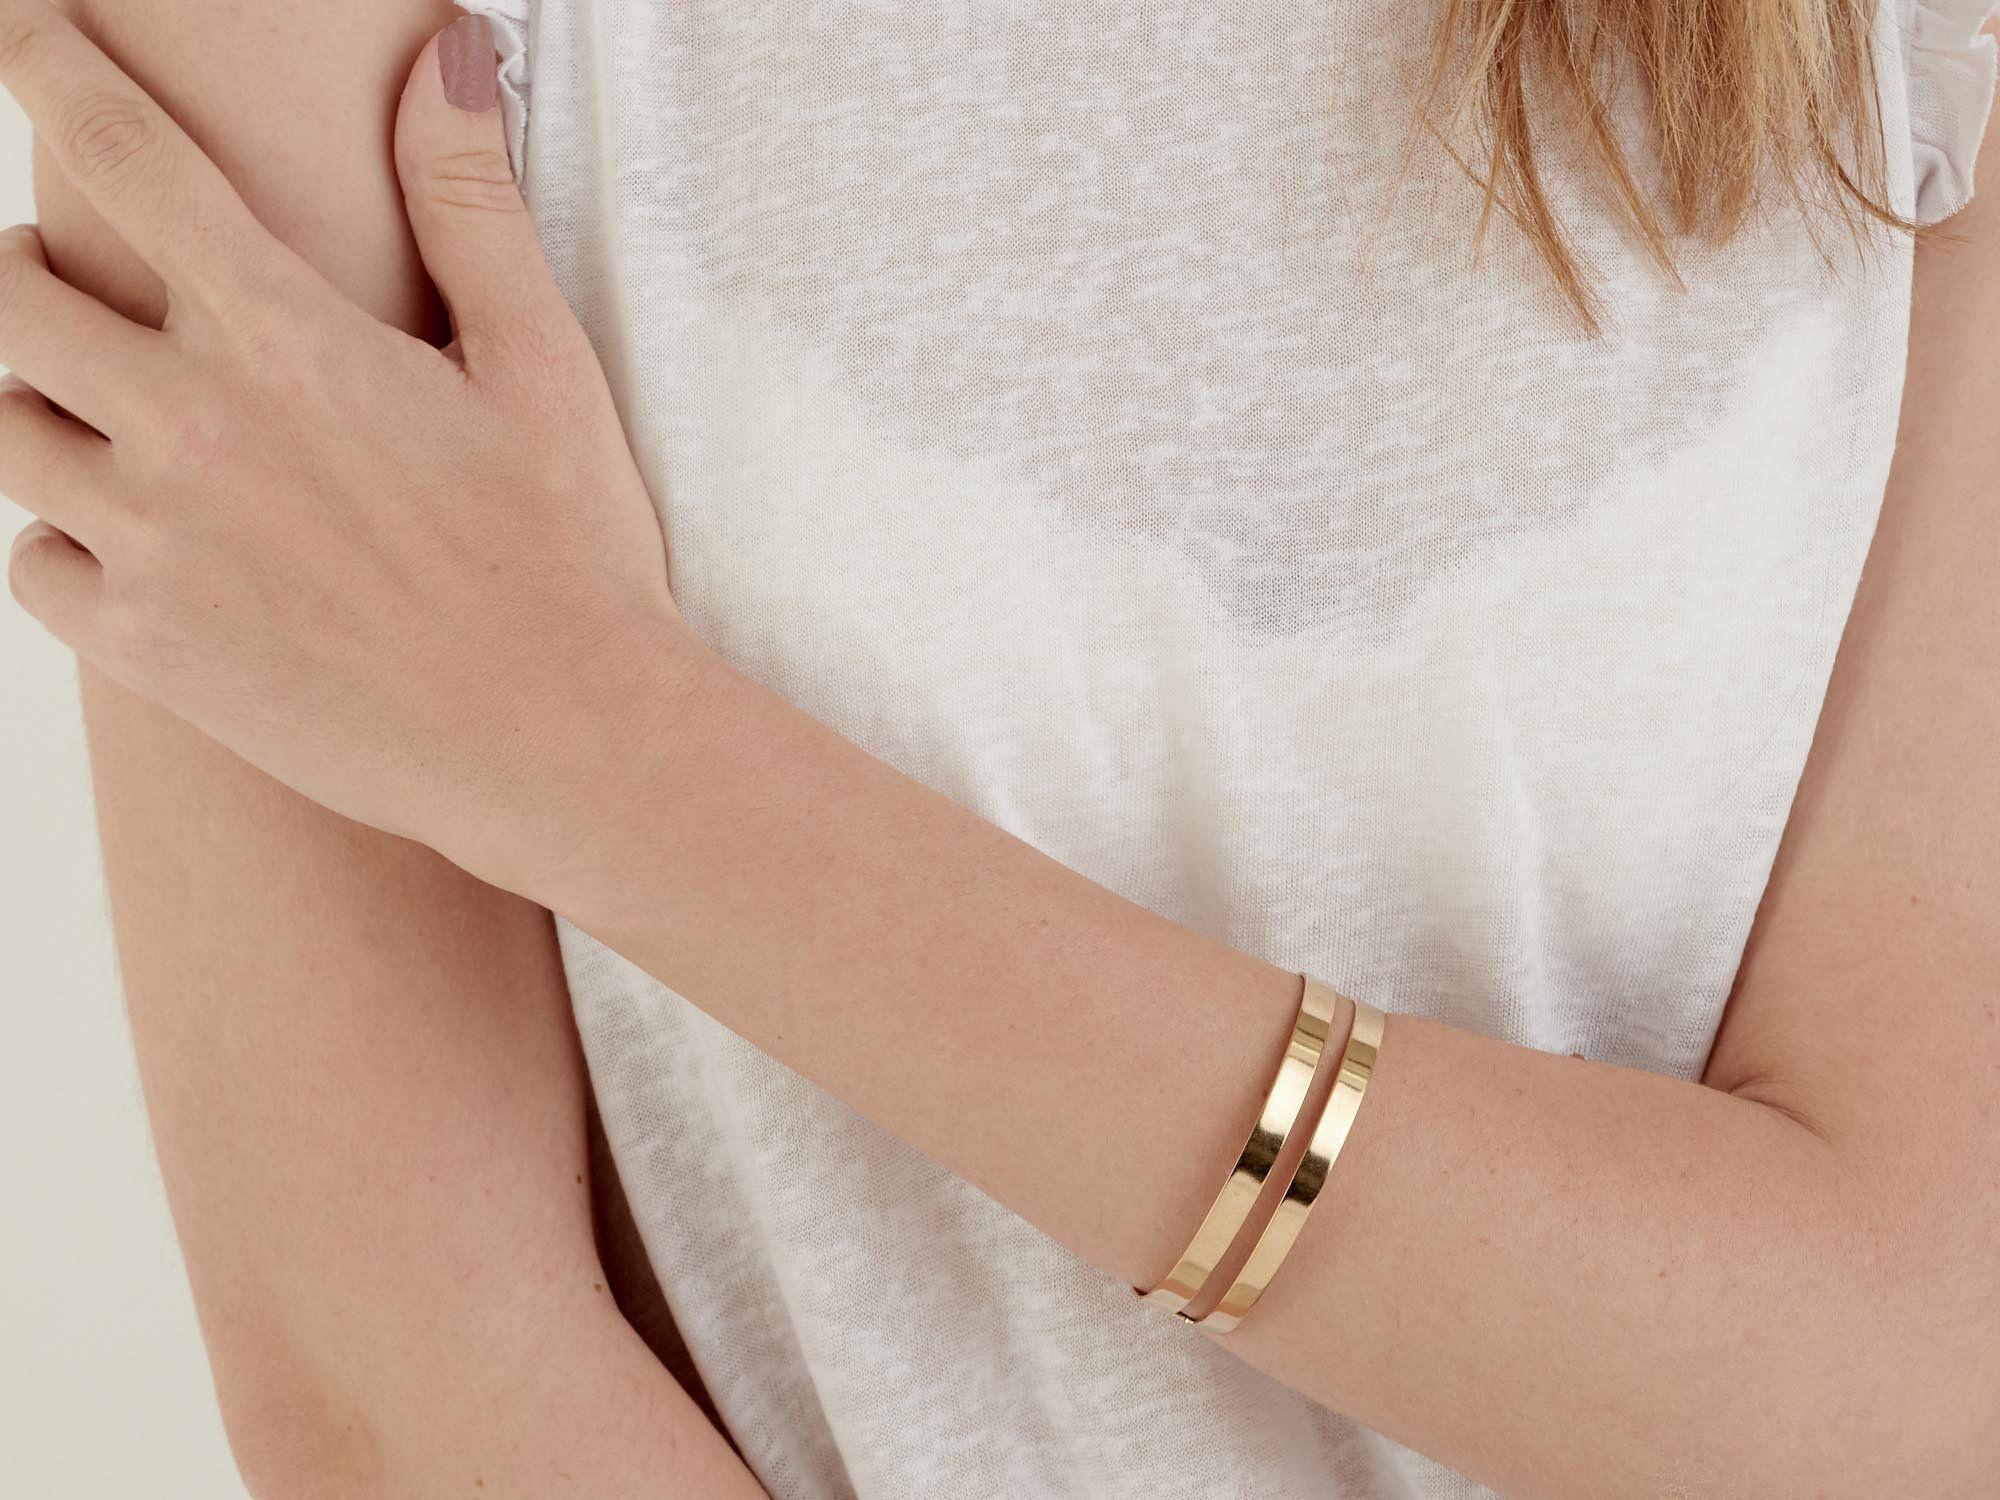 Gold Cuff Bracelet, Adjustable Bracelet, Minimalist Bracelet for Women, Statement Jewelry, Anniversary Gift, Dainty Stackable Bracelets